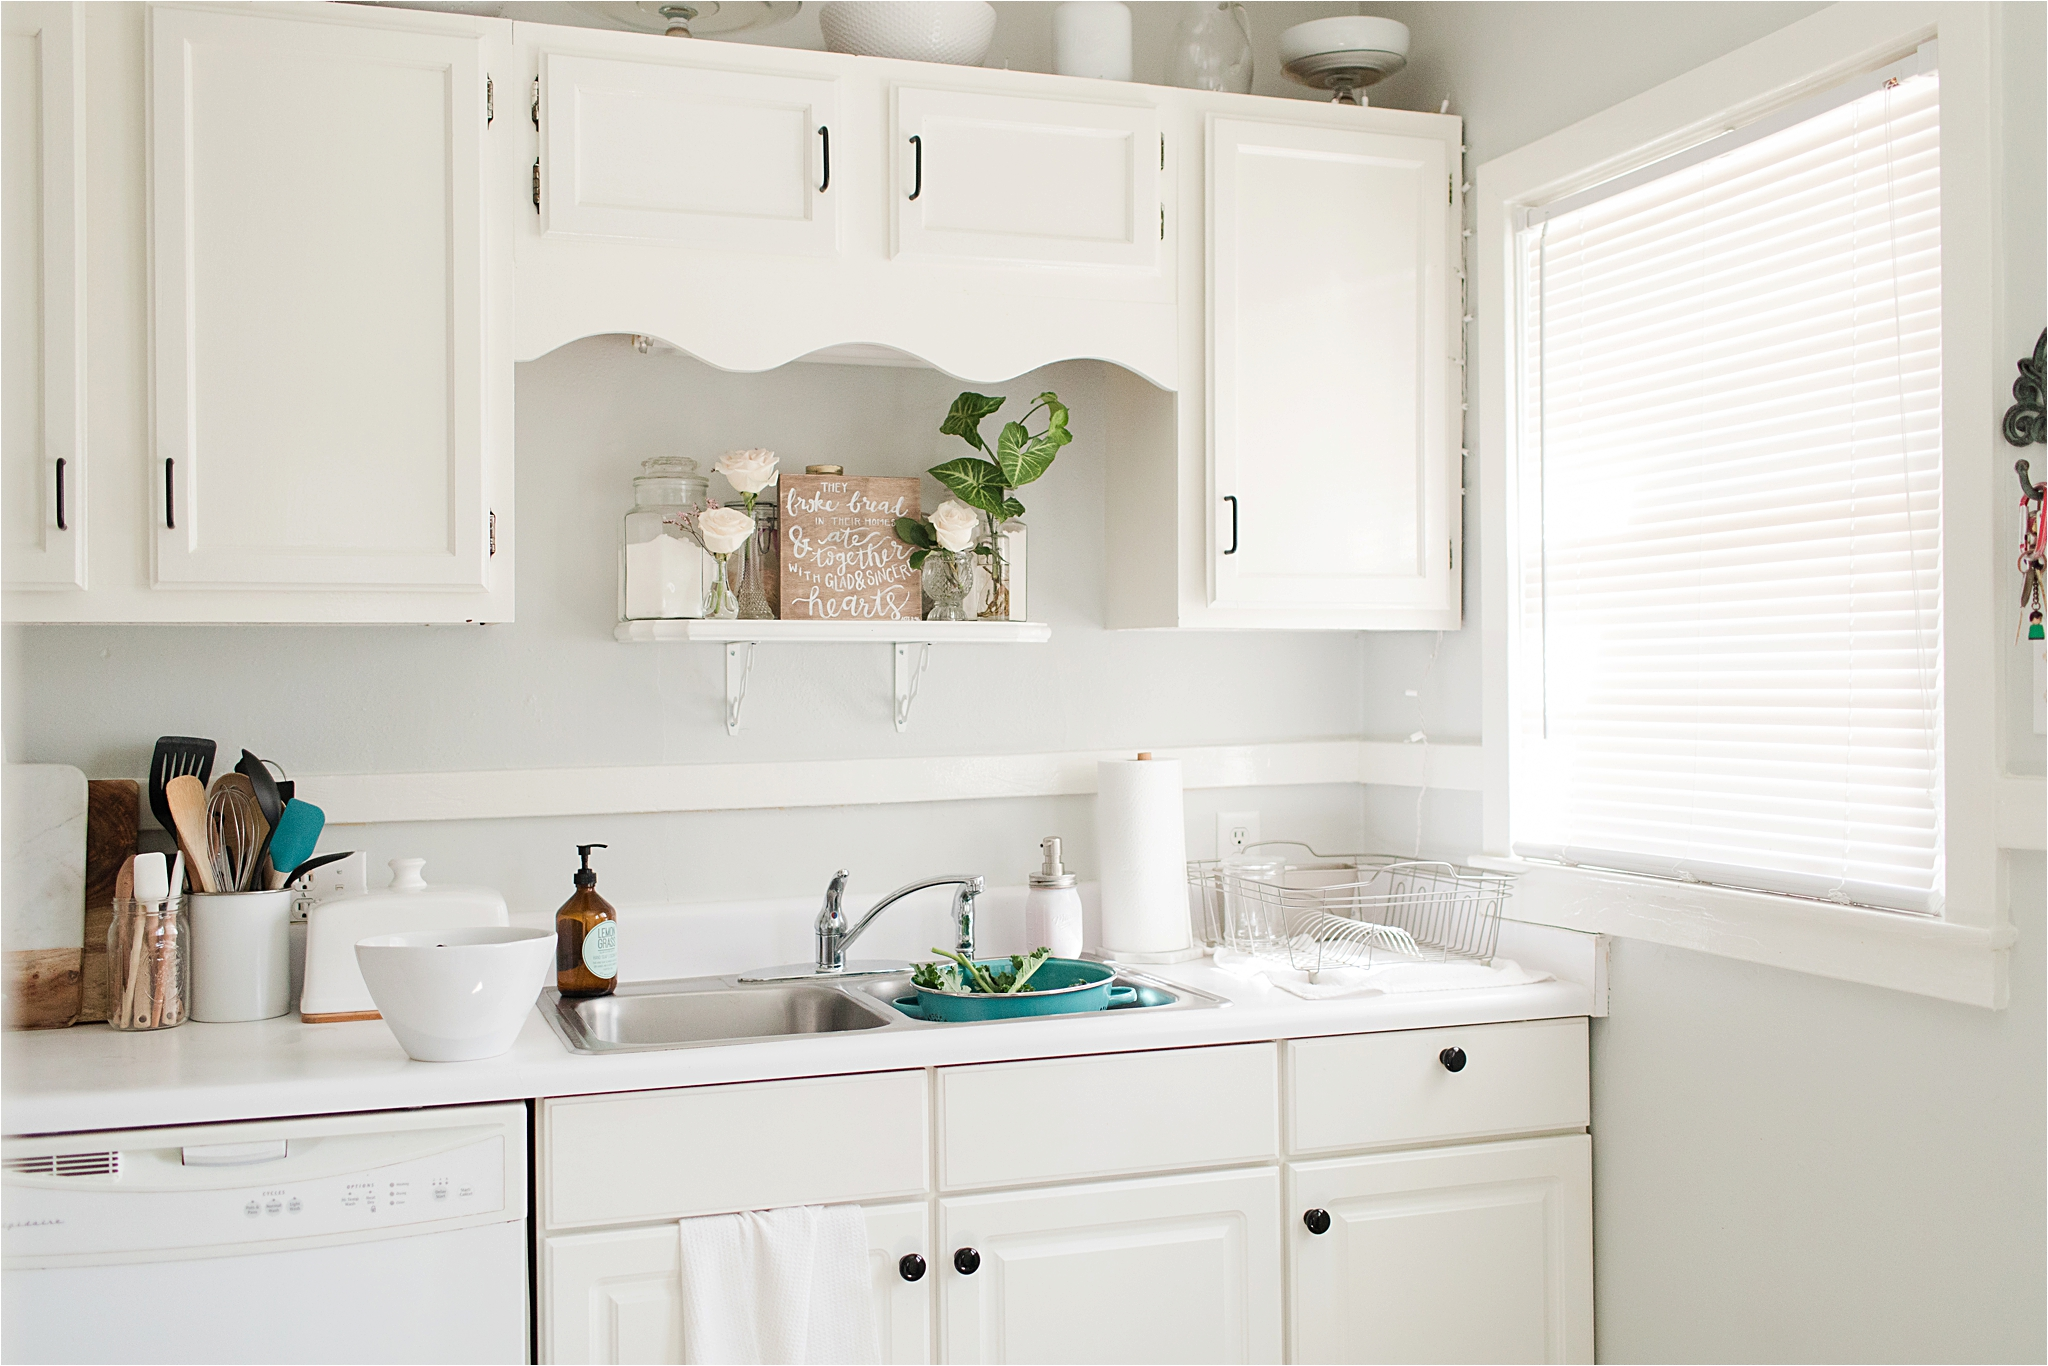 white-kitchen-house-home-kitchen-sink